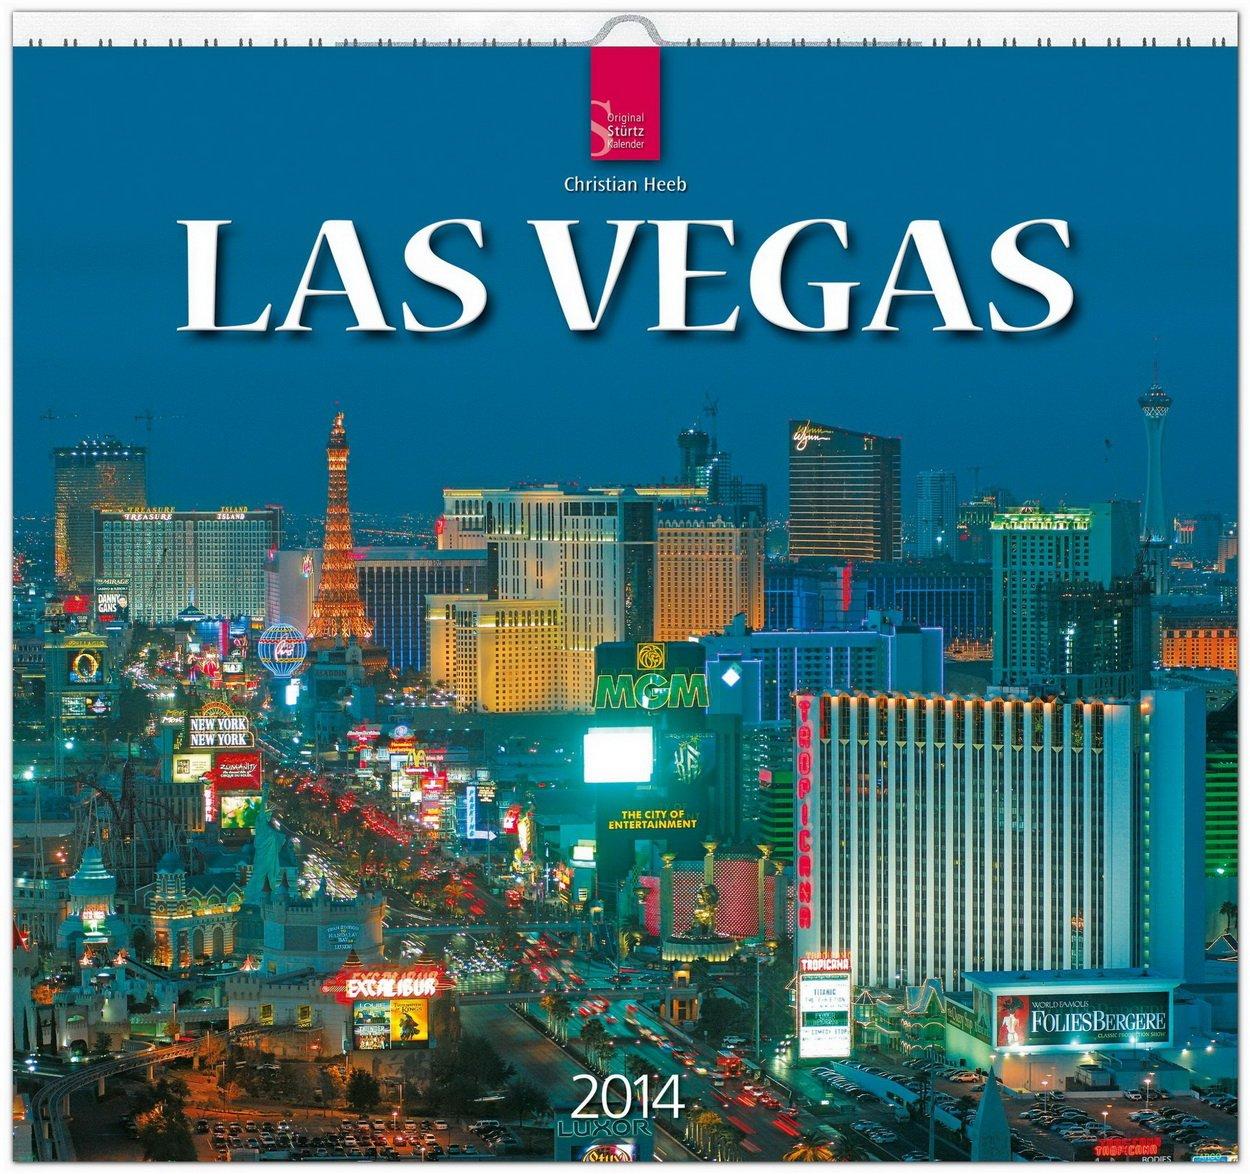 Las Vegas 2014: Original Stürtz-Kalender - Mittelformat-Kalender 33 x 31 cm [Spiralbindung]